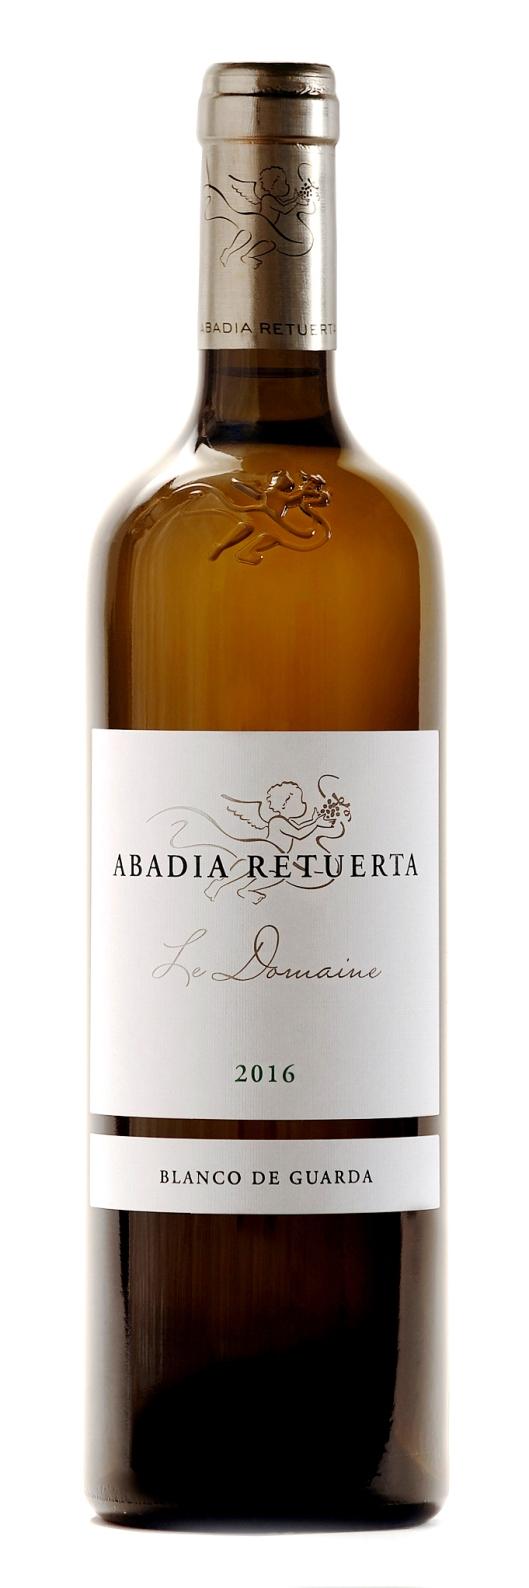 abadía retreta, vino blanco, le domaine, vino, cosecha, 2016, rueda,